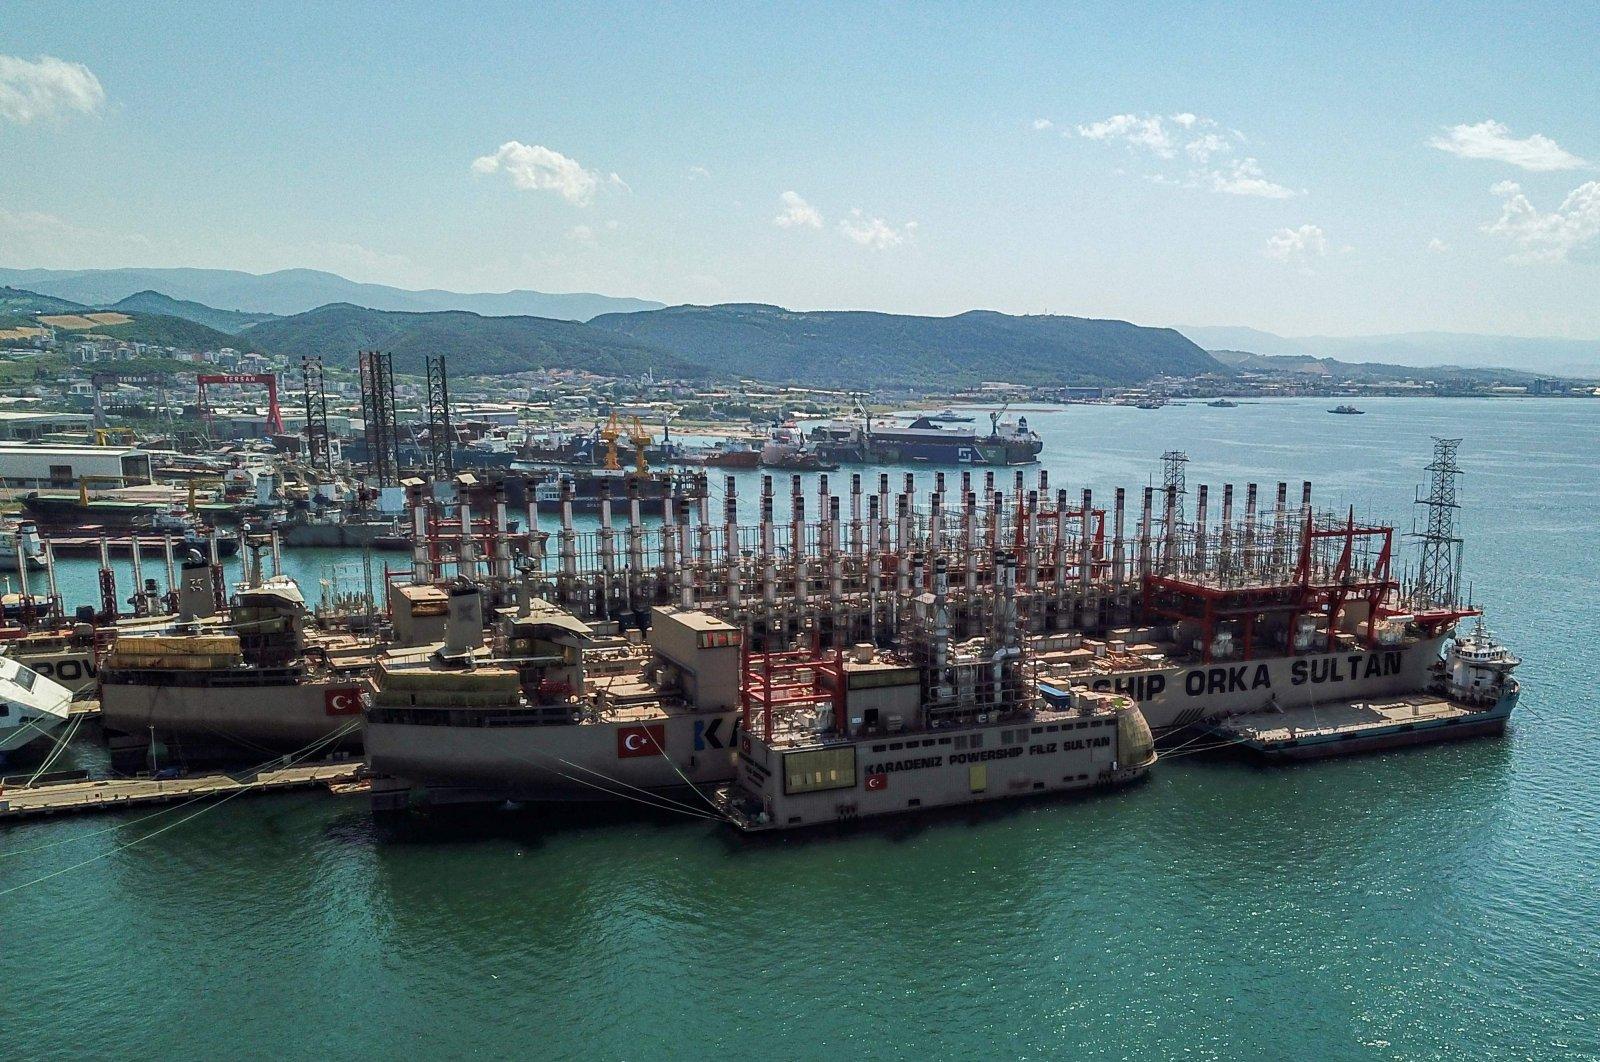 An aerial view shows Karadeniz Holding's powerships docked in a shipyard at Altınova district in Yalova, northwestern Turkey, June 16, 2020. (AFP Photo)